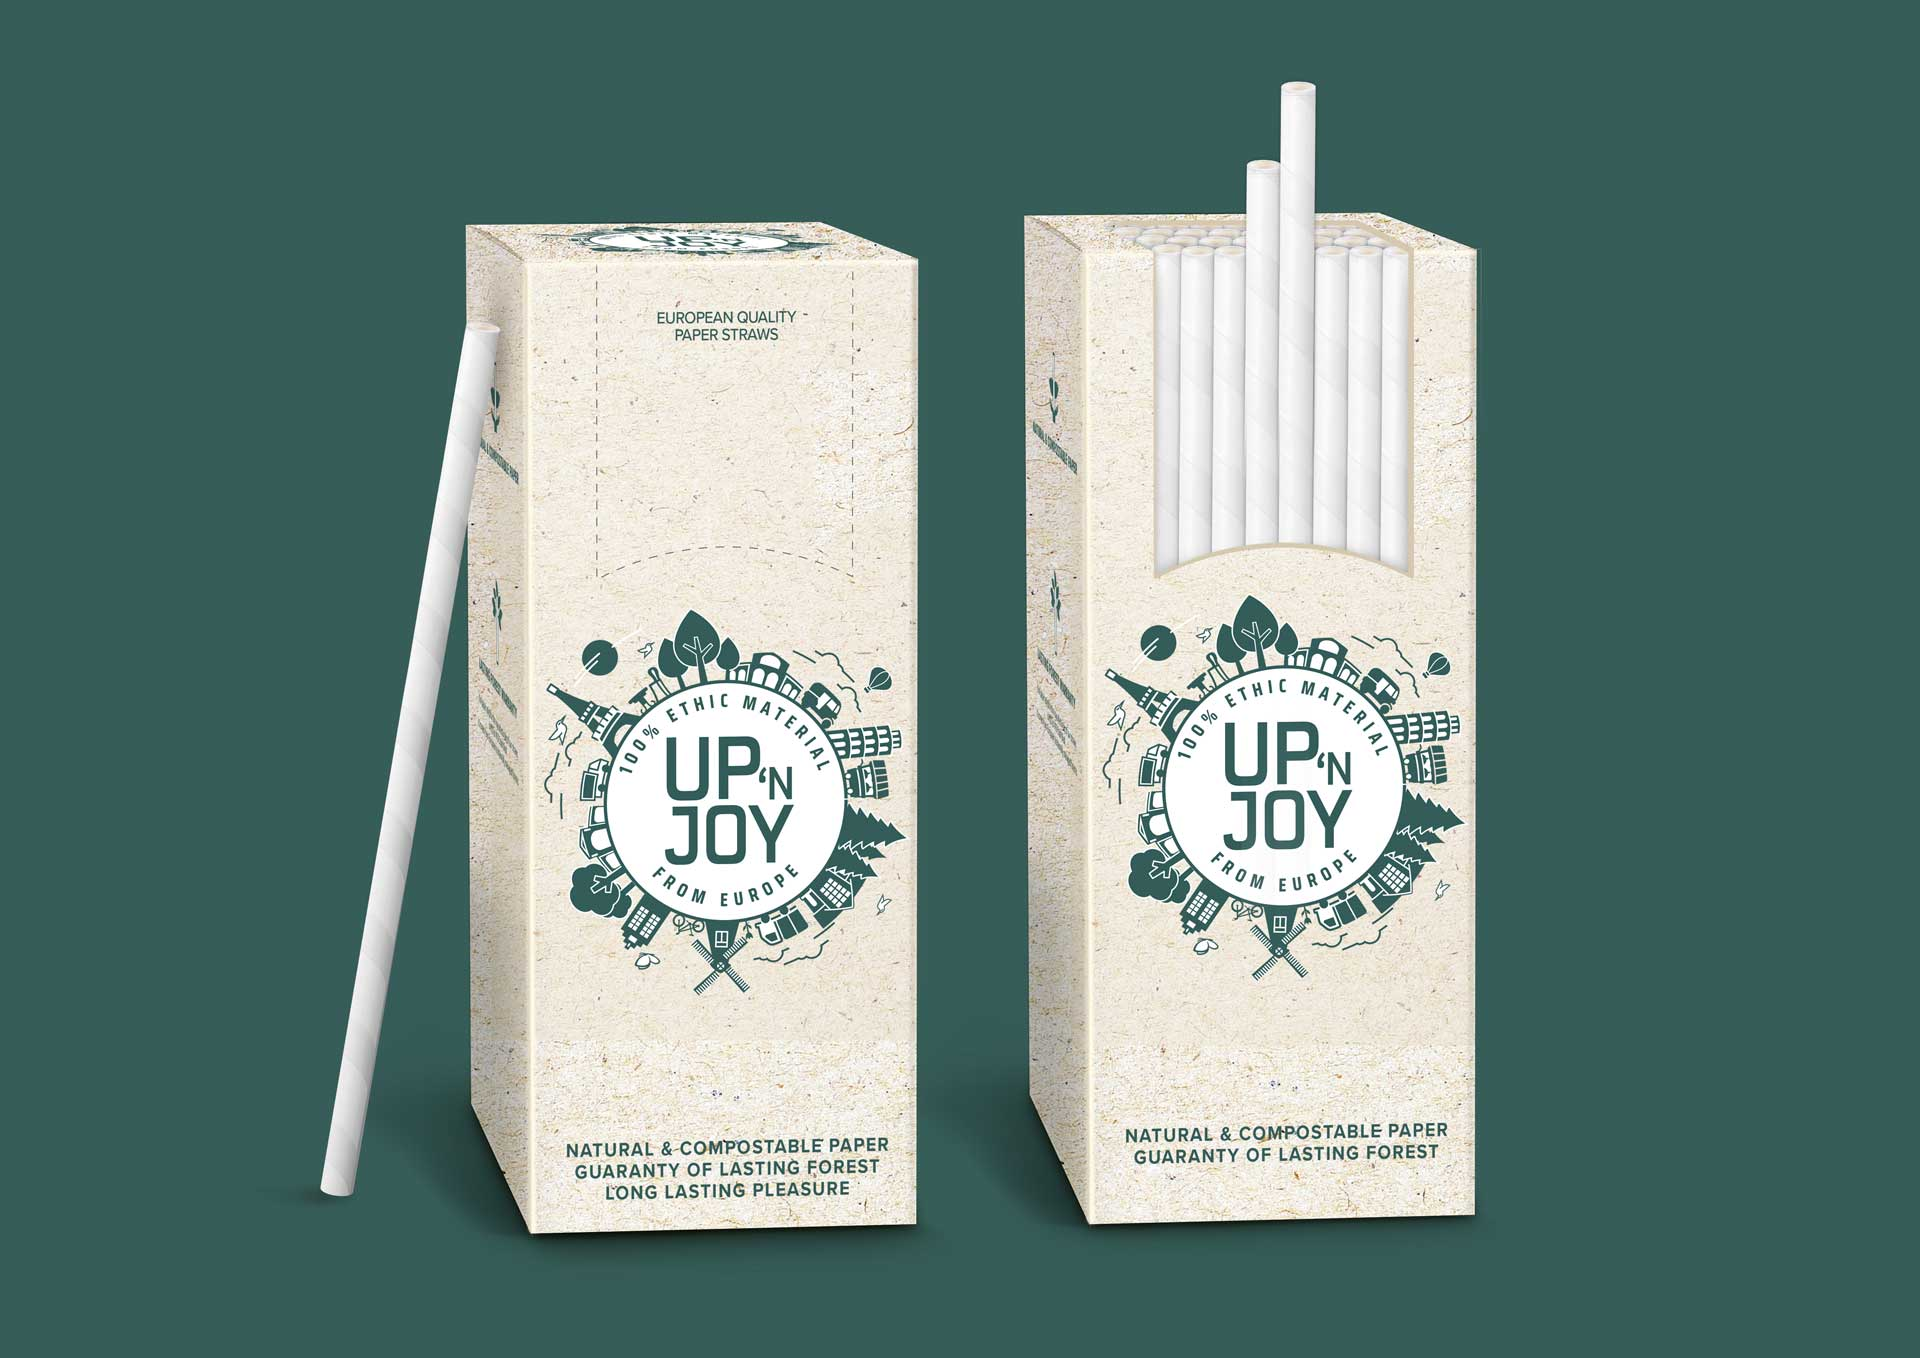 Elixir Design - Up'n Joy 1